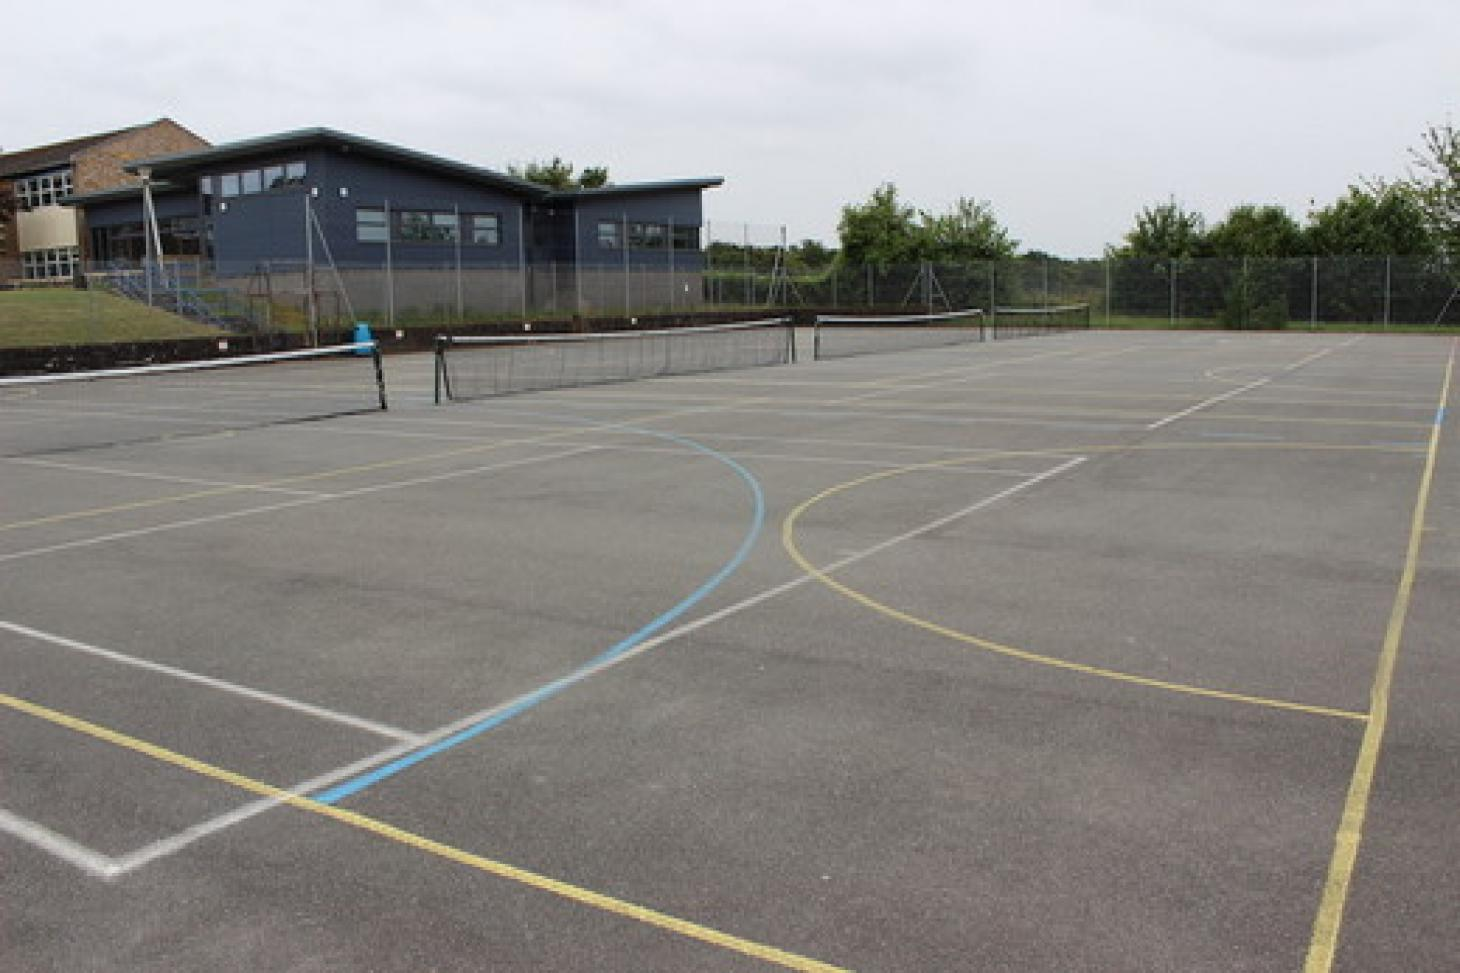 Amersham School Outdoor | Hard (macadam) netball court